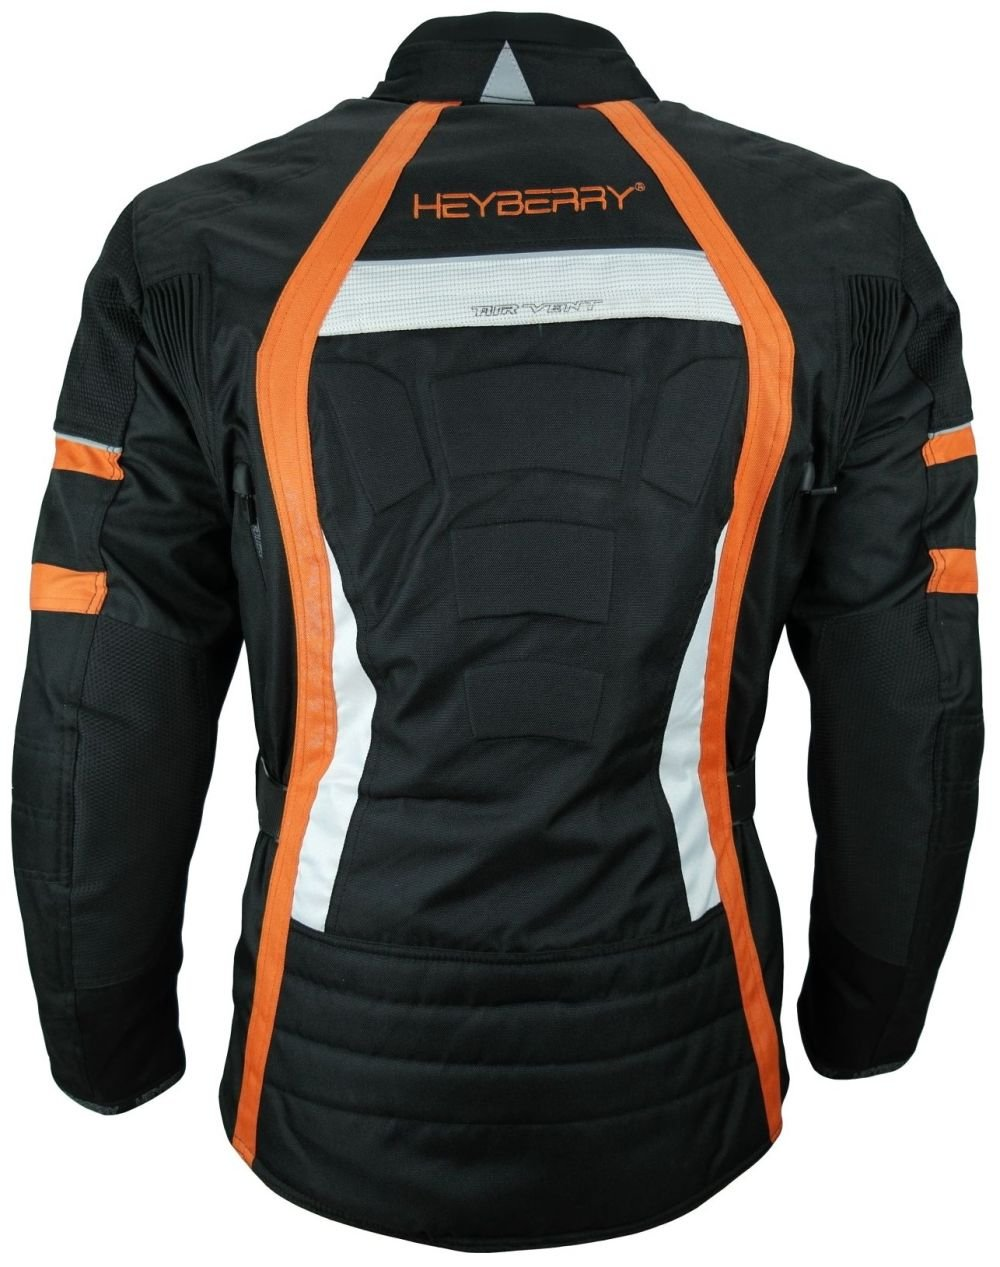 3XL Heyberry Touren Motorrad Jacke Motorradjacke Textil schwarz orange Gr